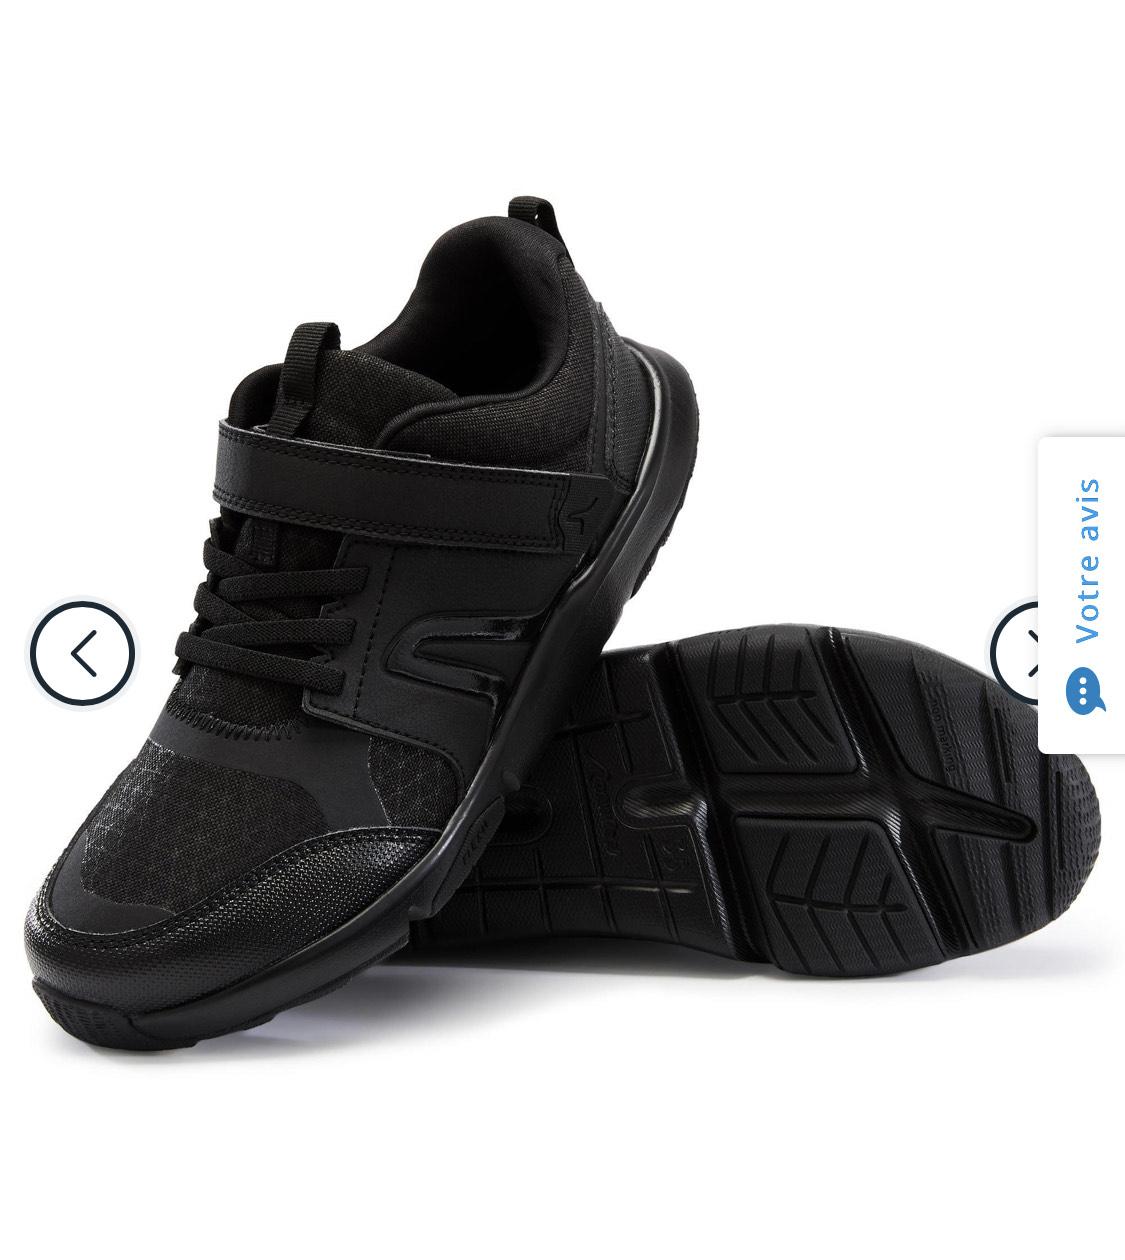 Chaussures de Marche enfant Newfeel Actiwalk Noir